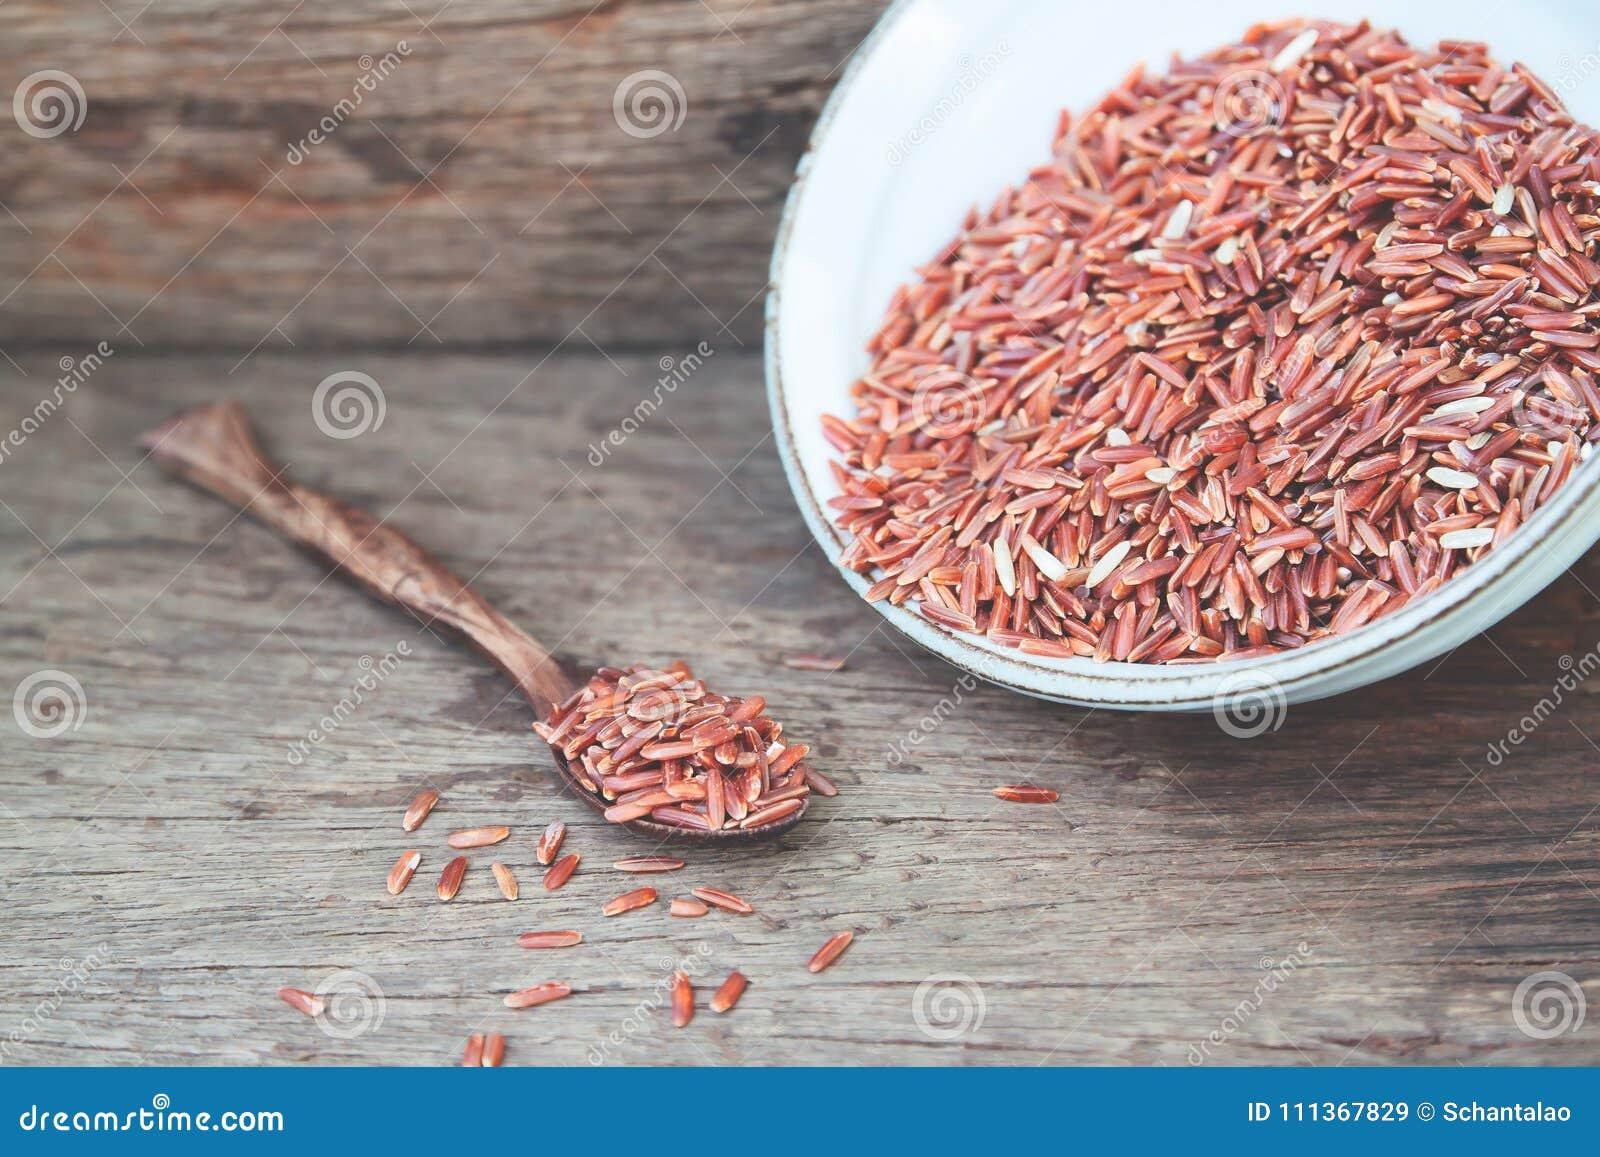 diabetes de azúcar moreno de arroz